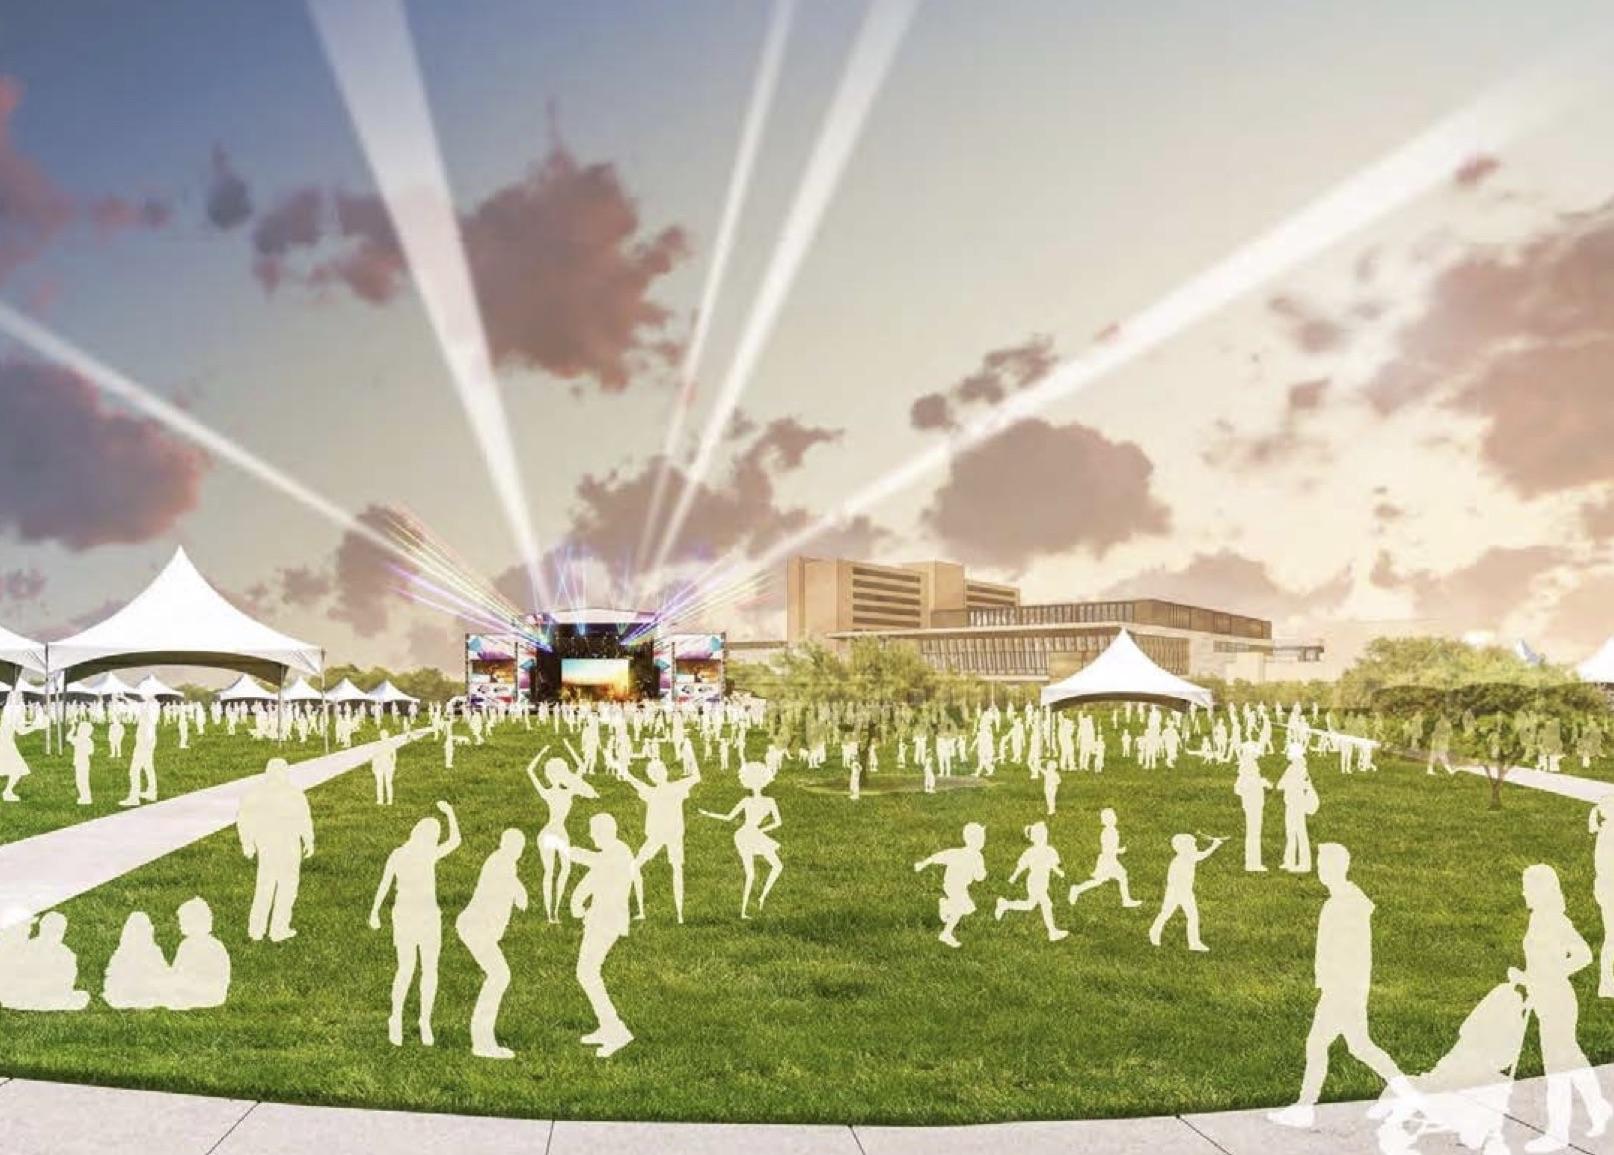 New Plan Reimagines Walter E. Long Park